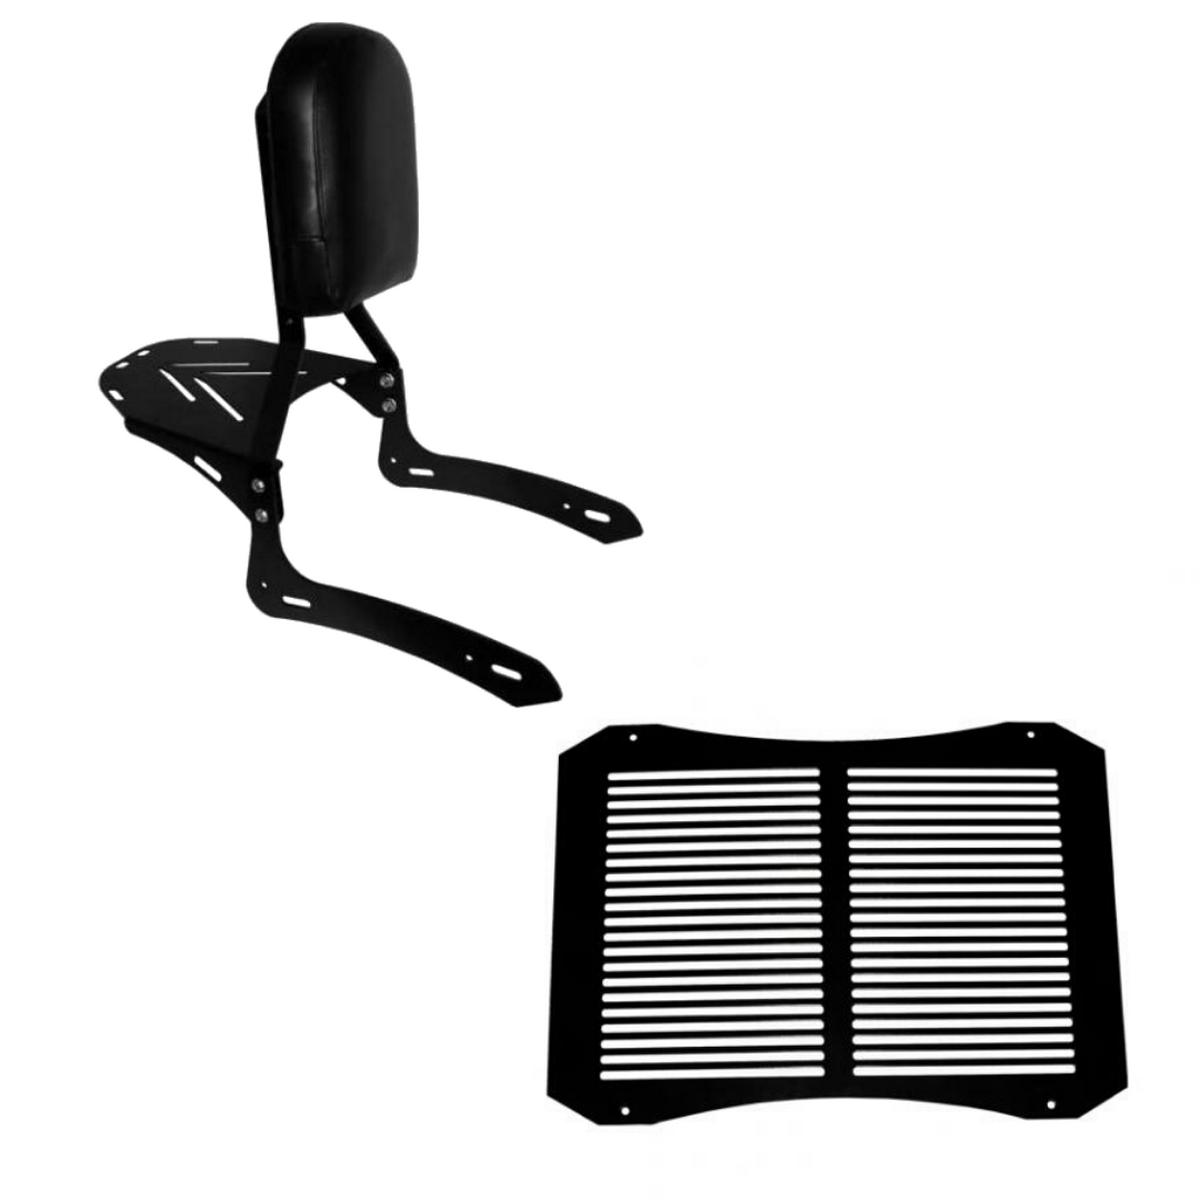 KIT Sissybar + Protetor de radiador Vulcan S 650